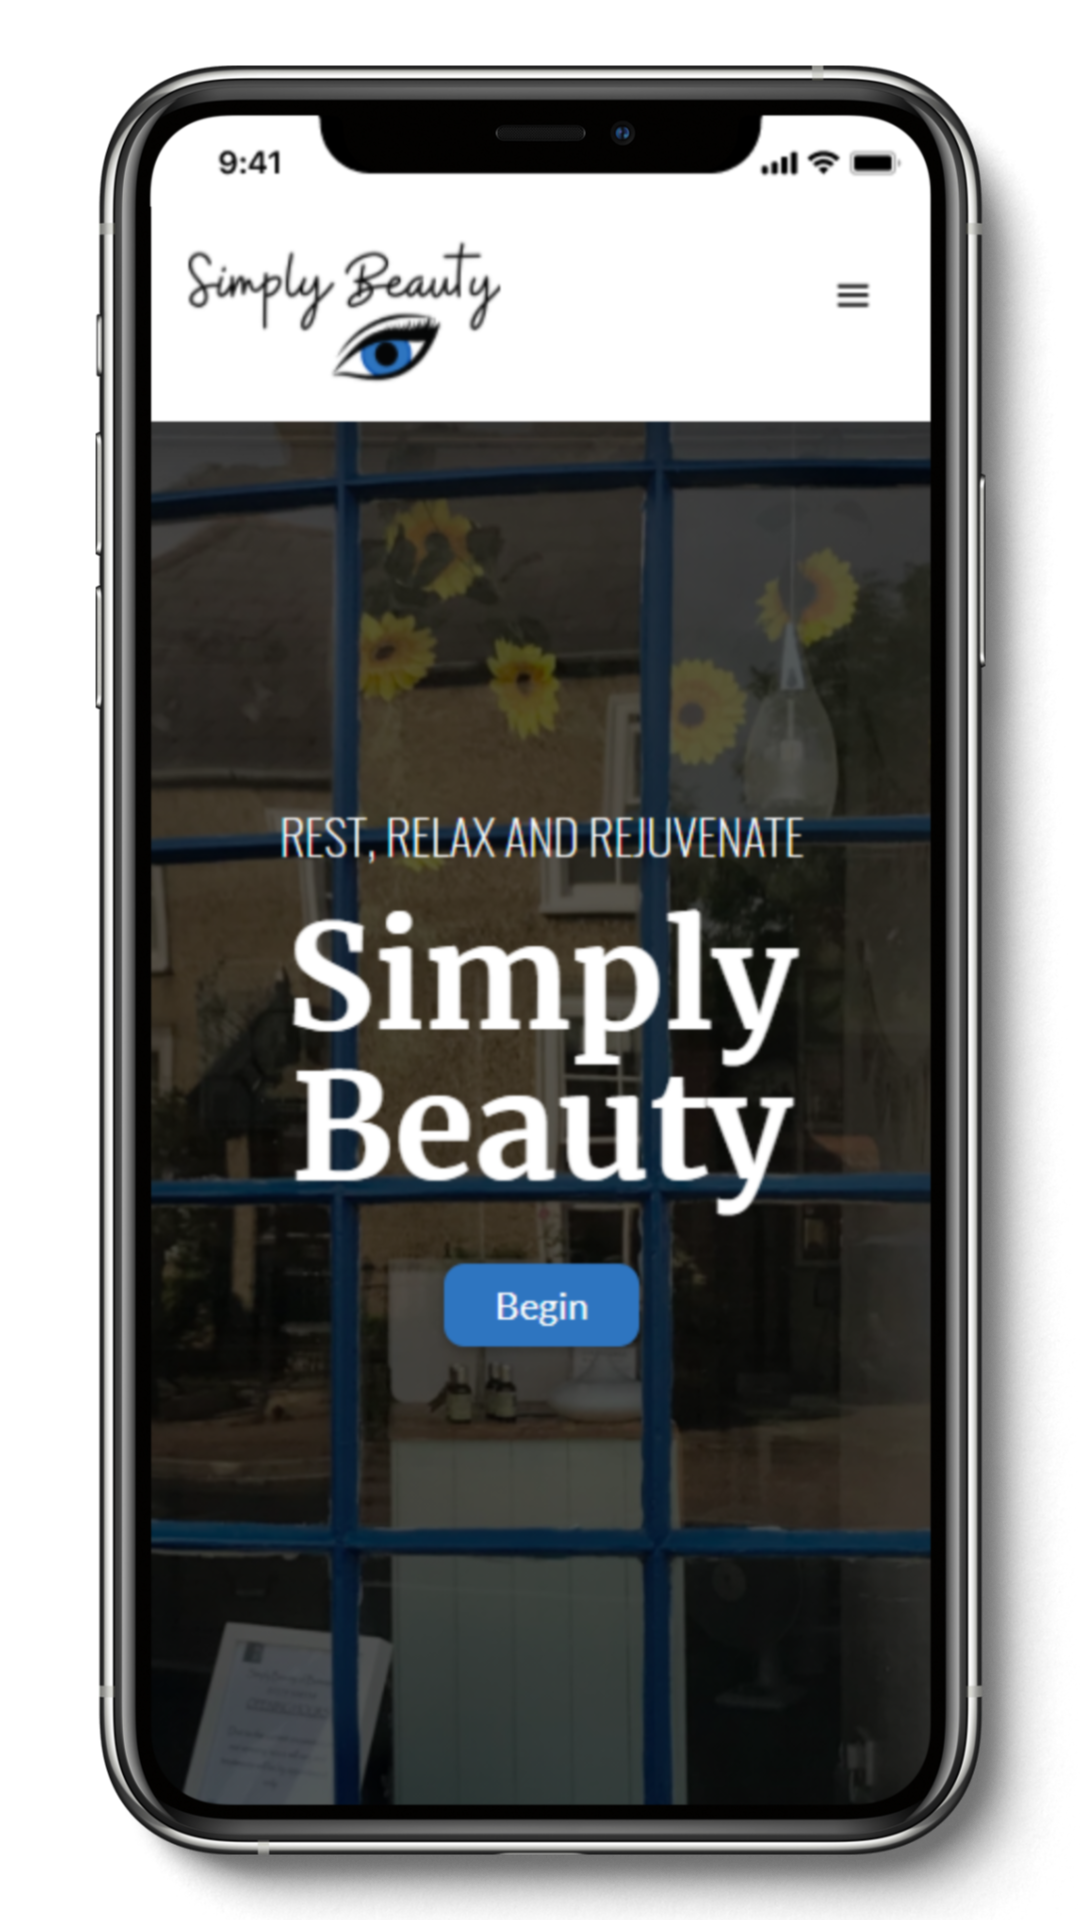 Simply Beauty Webflow Development created by Brett Hudson Design